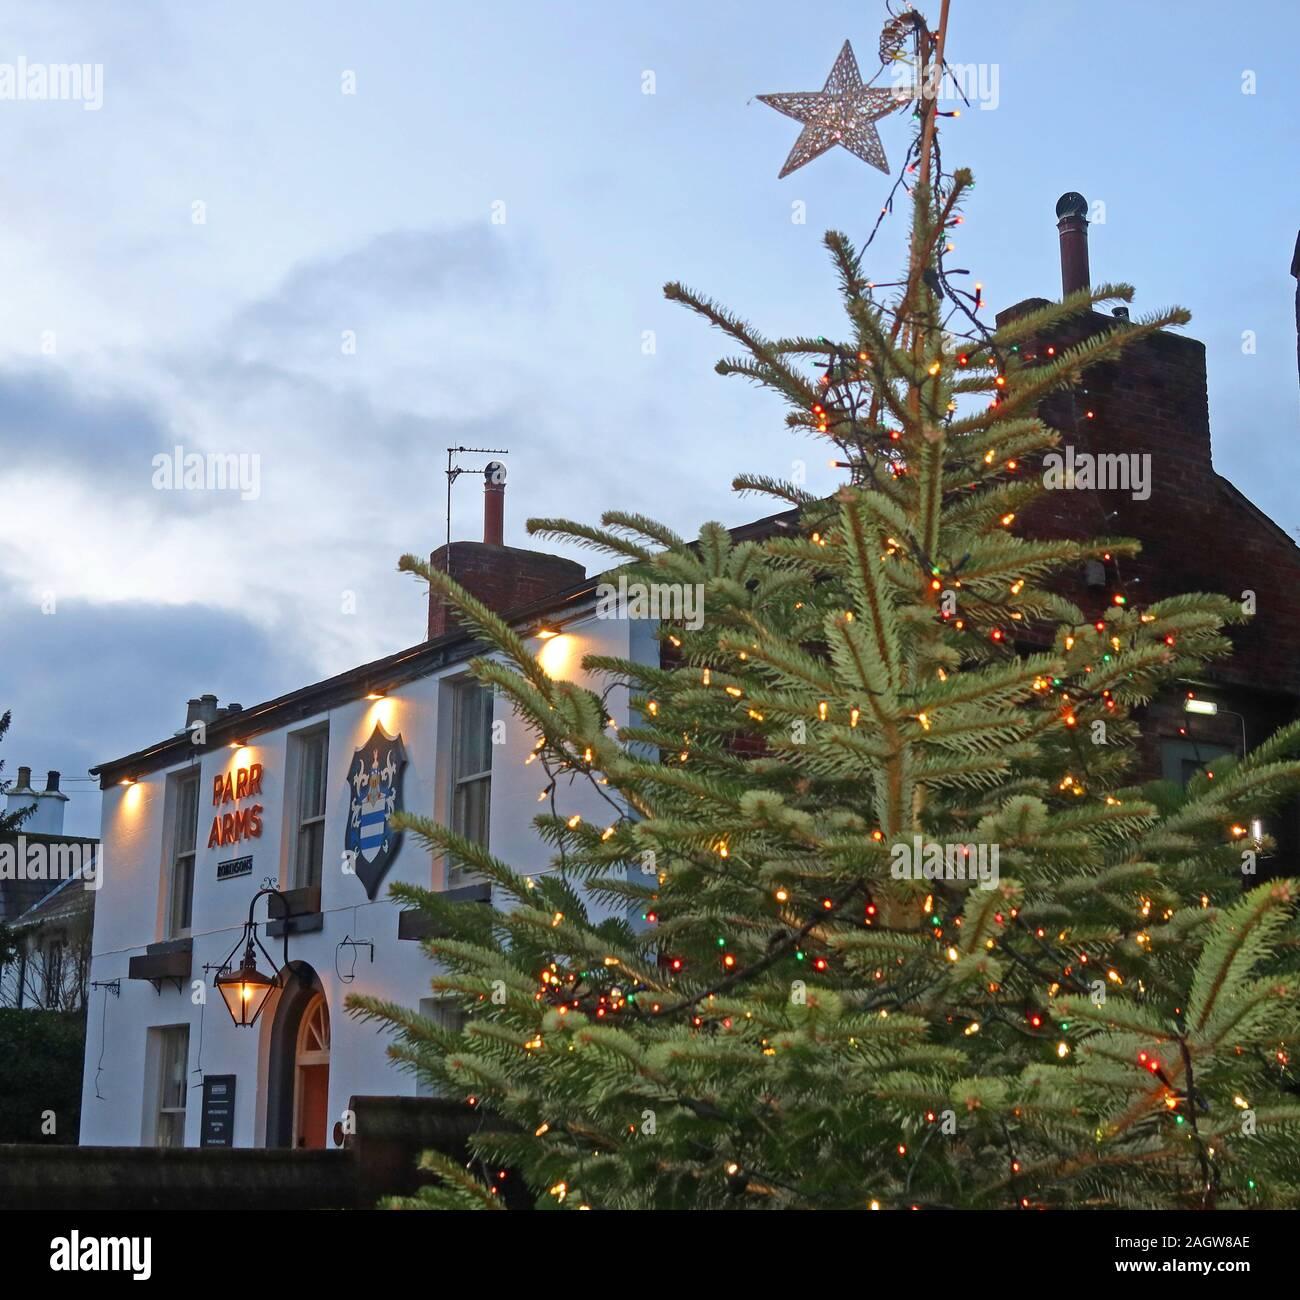 hotpixUk,@HotpixUK,GoTonySmith,Thelwall,South Warrington,WA4,Cheshire,England,UK,pub,bar,village pub,Warrington Villages,at Christmas,Xmas Tree,Christmas Tree,at Xmas,star,lights,Parr Arms Inn,St Wilfrids Church,St Wilfrids,Parr Arms Xmas,Parr Arms Christmas,Robinson,Robinsons,Robinson Pub,Frederic Robinson,Church Lane,Grappenhall,Warrington,dusk,night,Xmas,Christmas